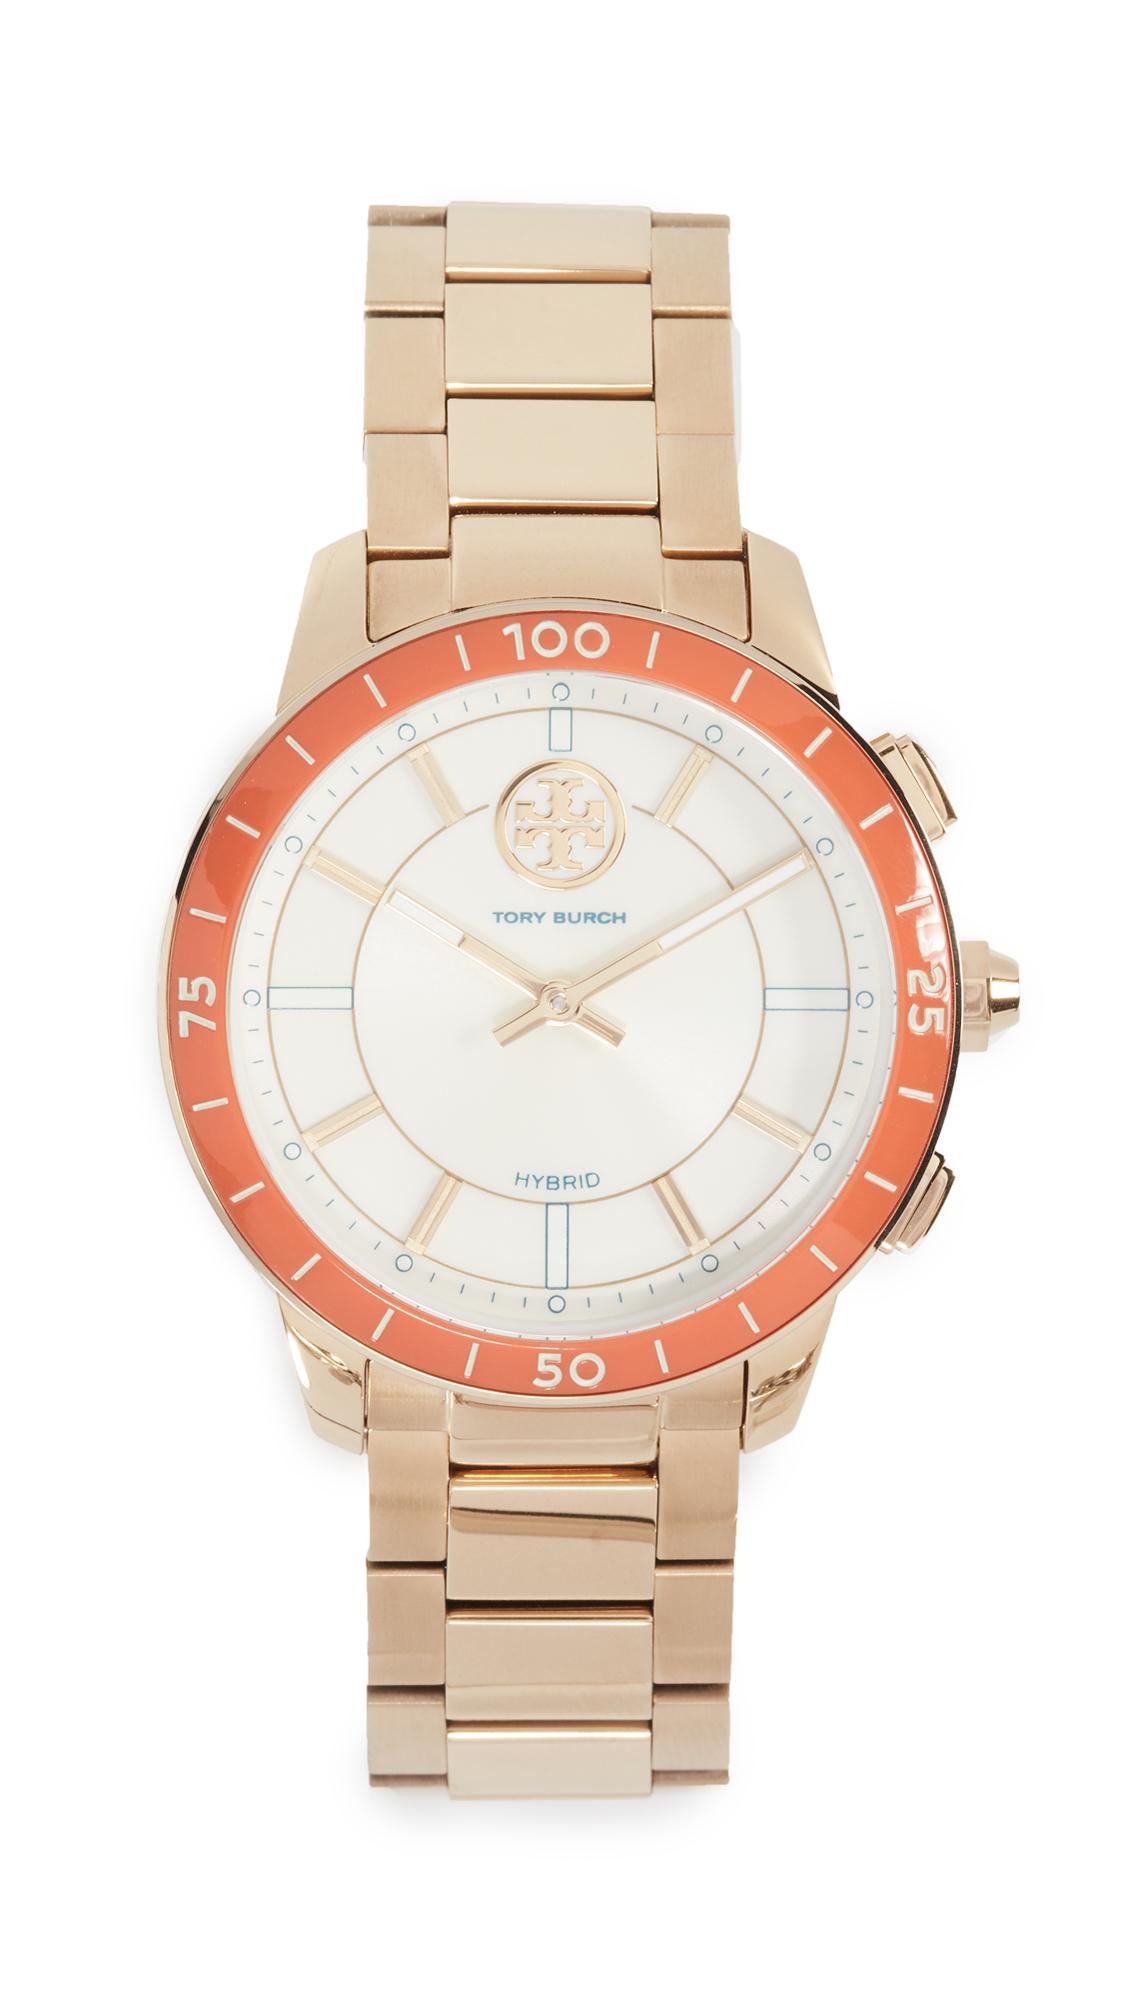 Tory Burch Collins Hybrid Watch, 38MM - Ivory/Gold